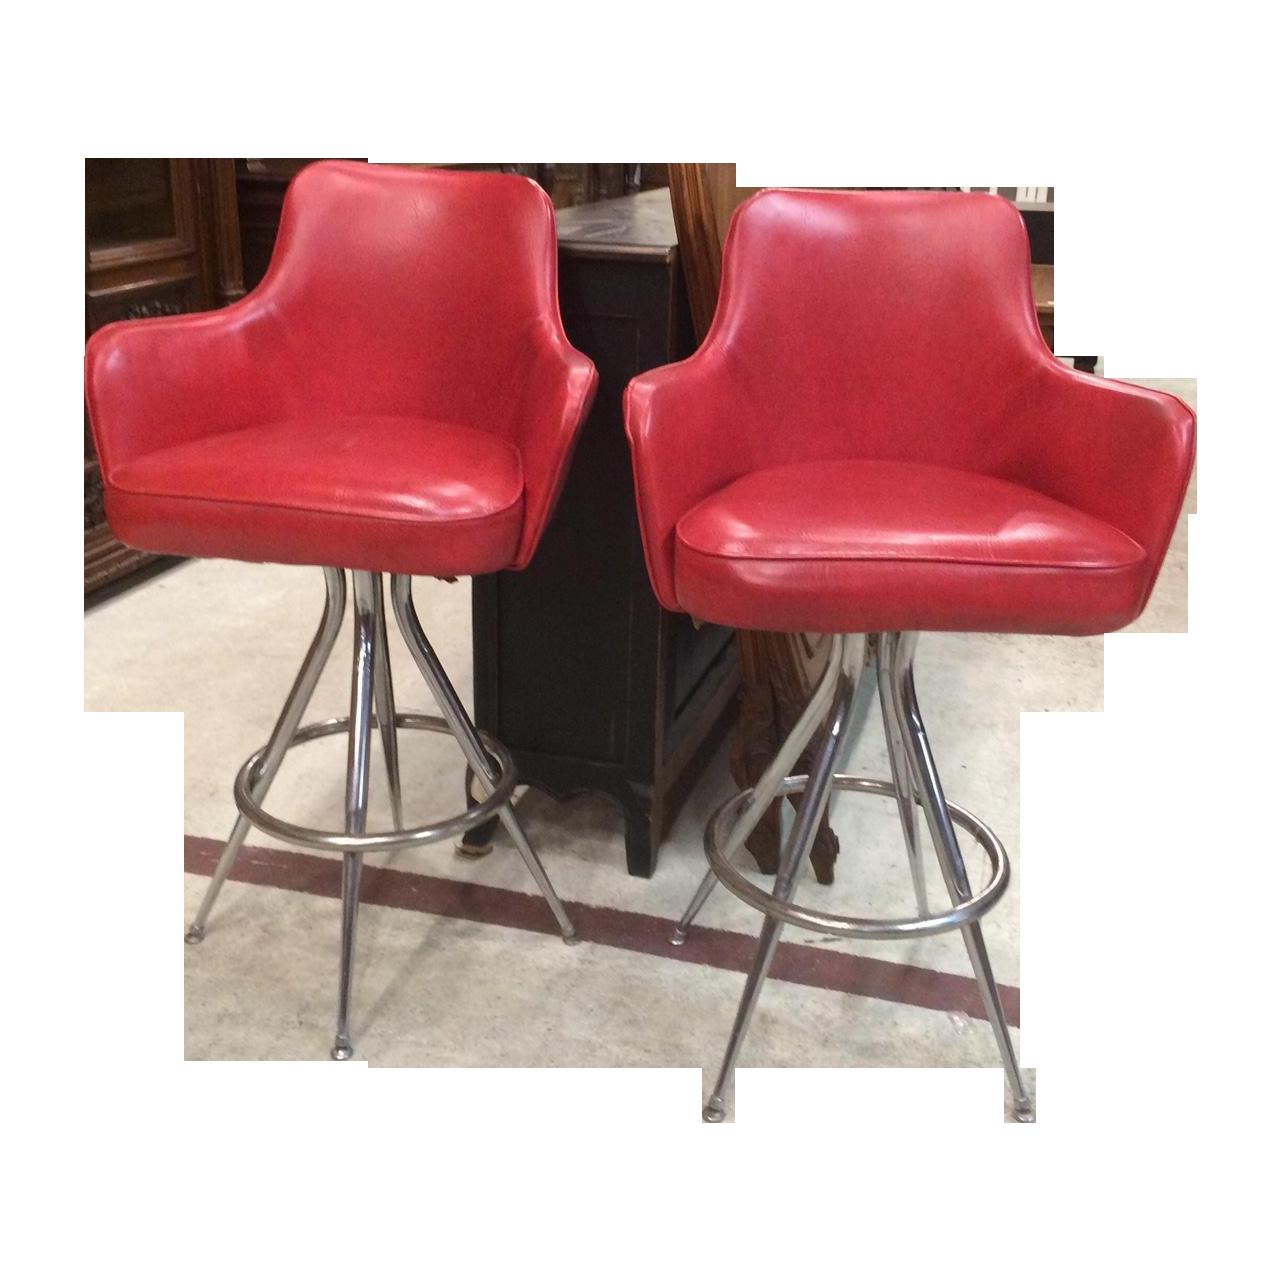 vintage 1970s red bar stools - pair | chairish 1970s Bar Stools